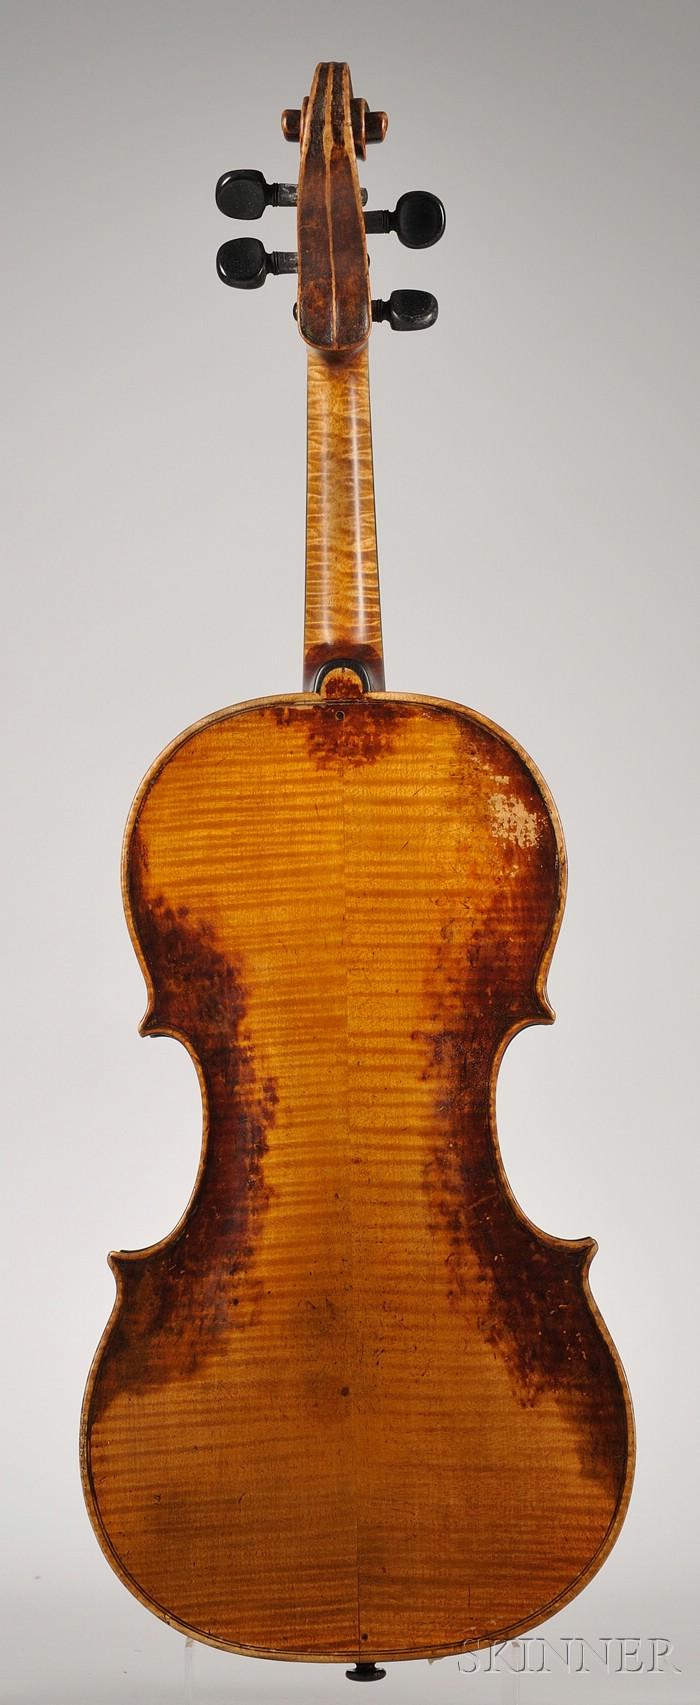 Tyrolean Violin, c. 1850, Ascribed to Matteo Albani